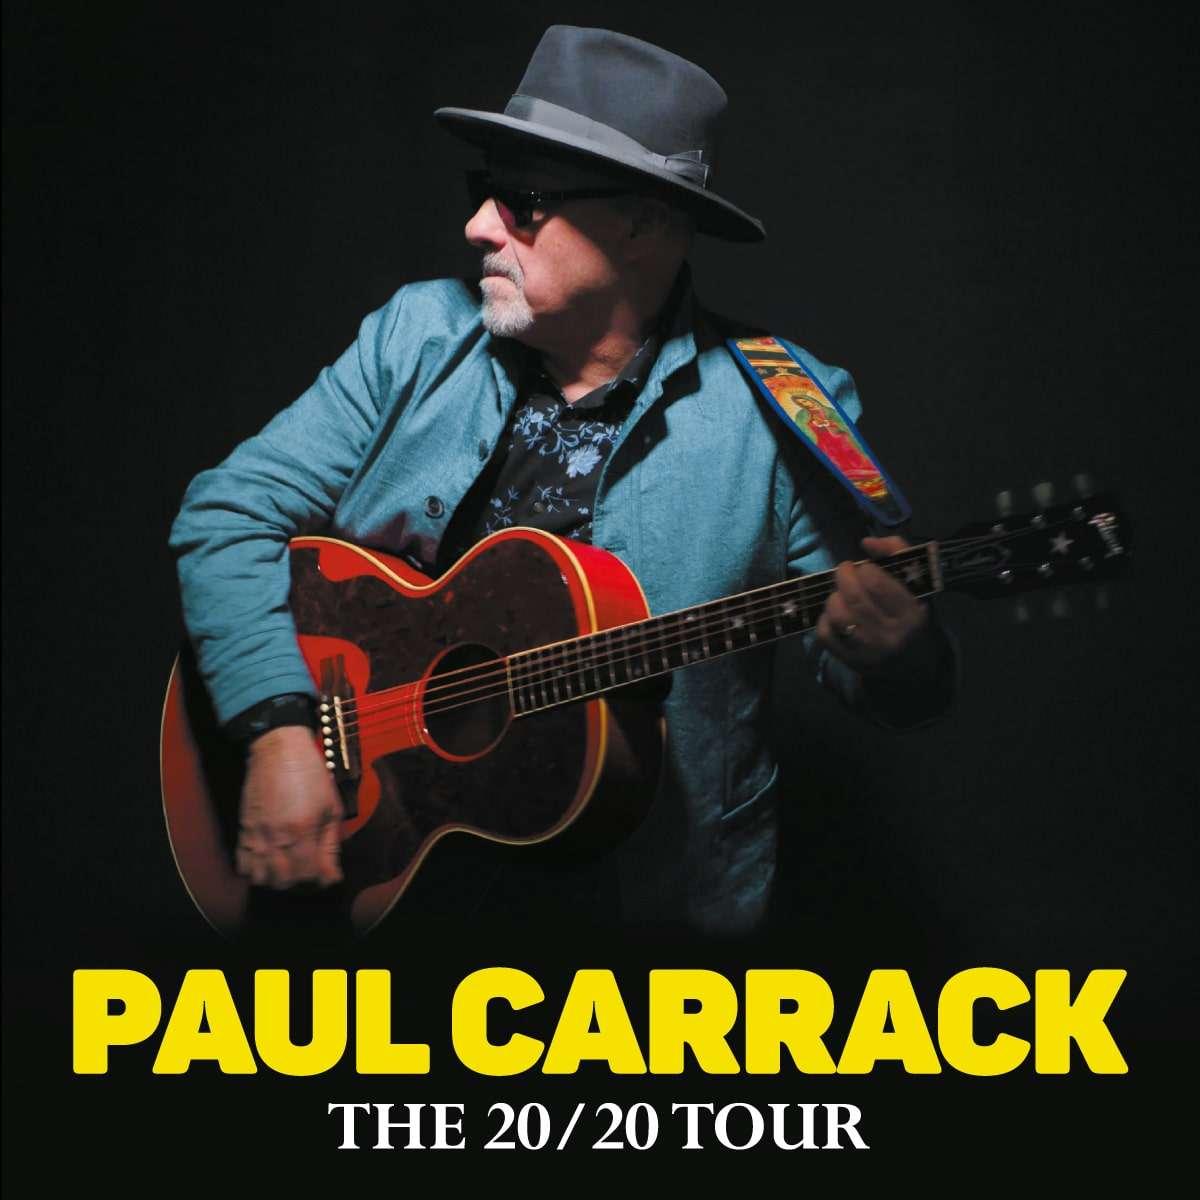 The 20/20 Tour - Paul Carrack - Paderhalle - Paderborn